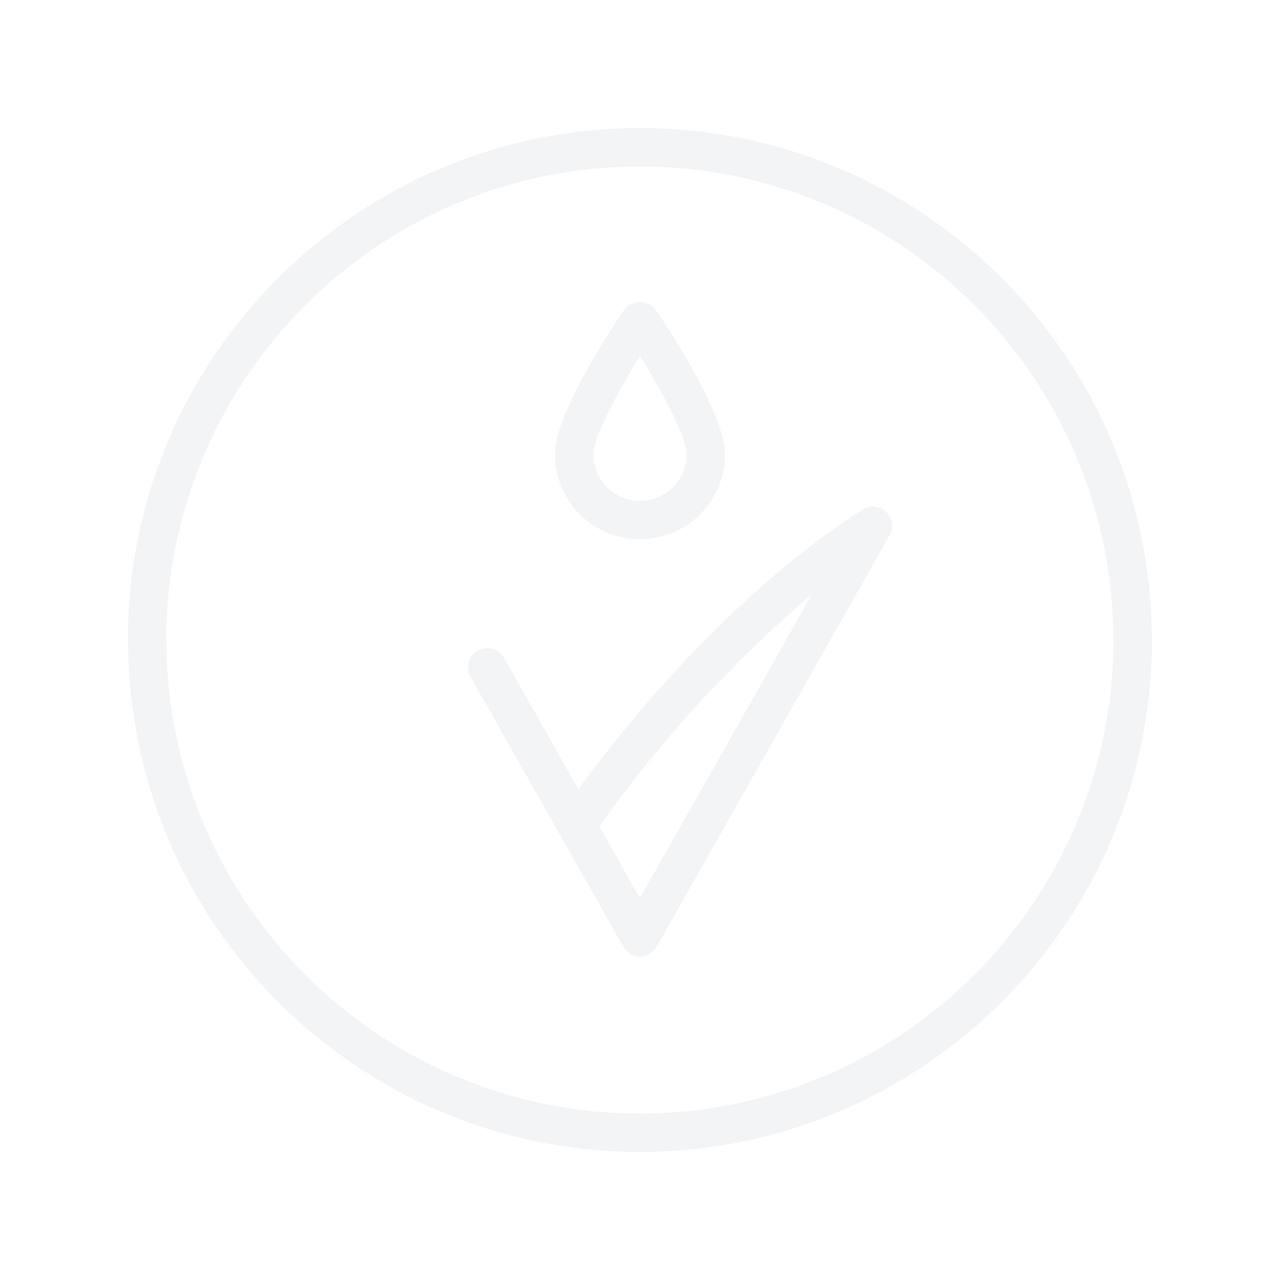 BVLGARI Aqva Pour Homme Atlantiqve Shampoo & Shower Gel 200ml